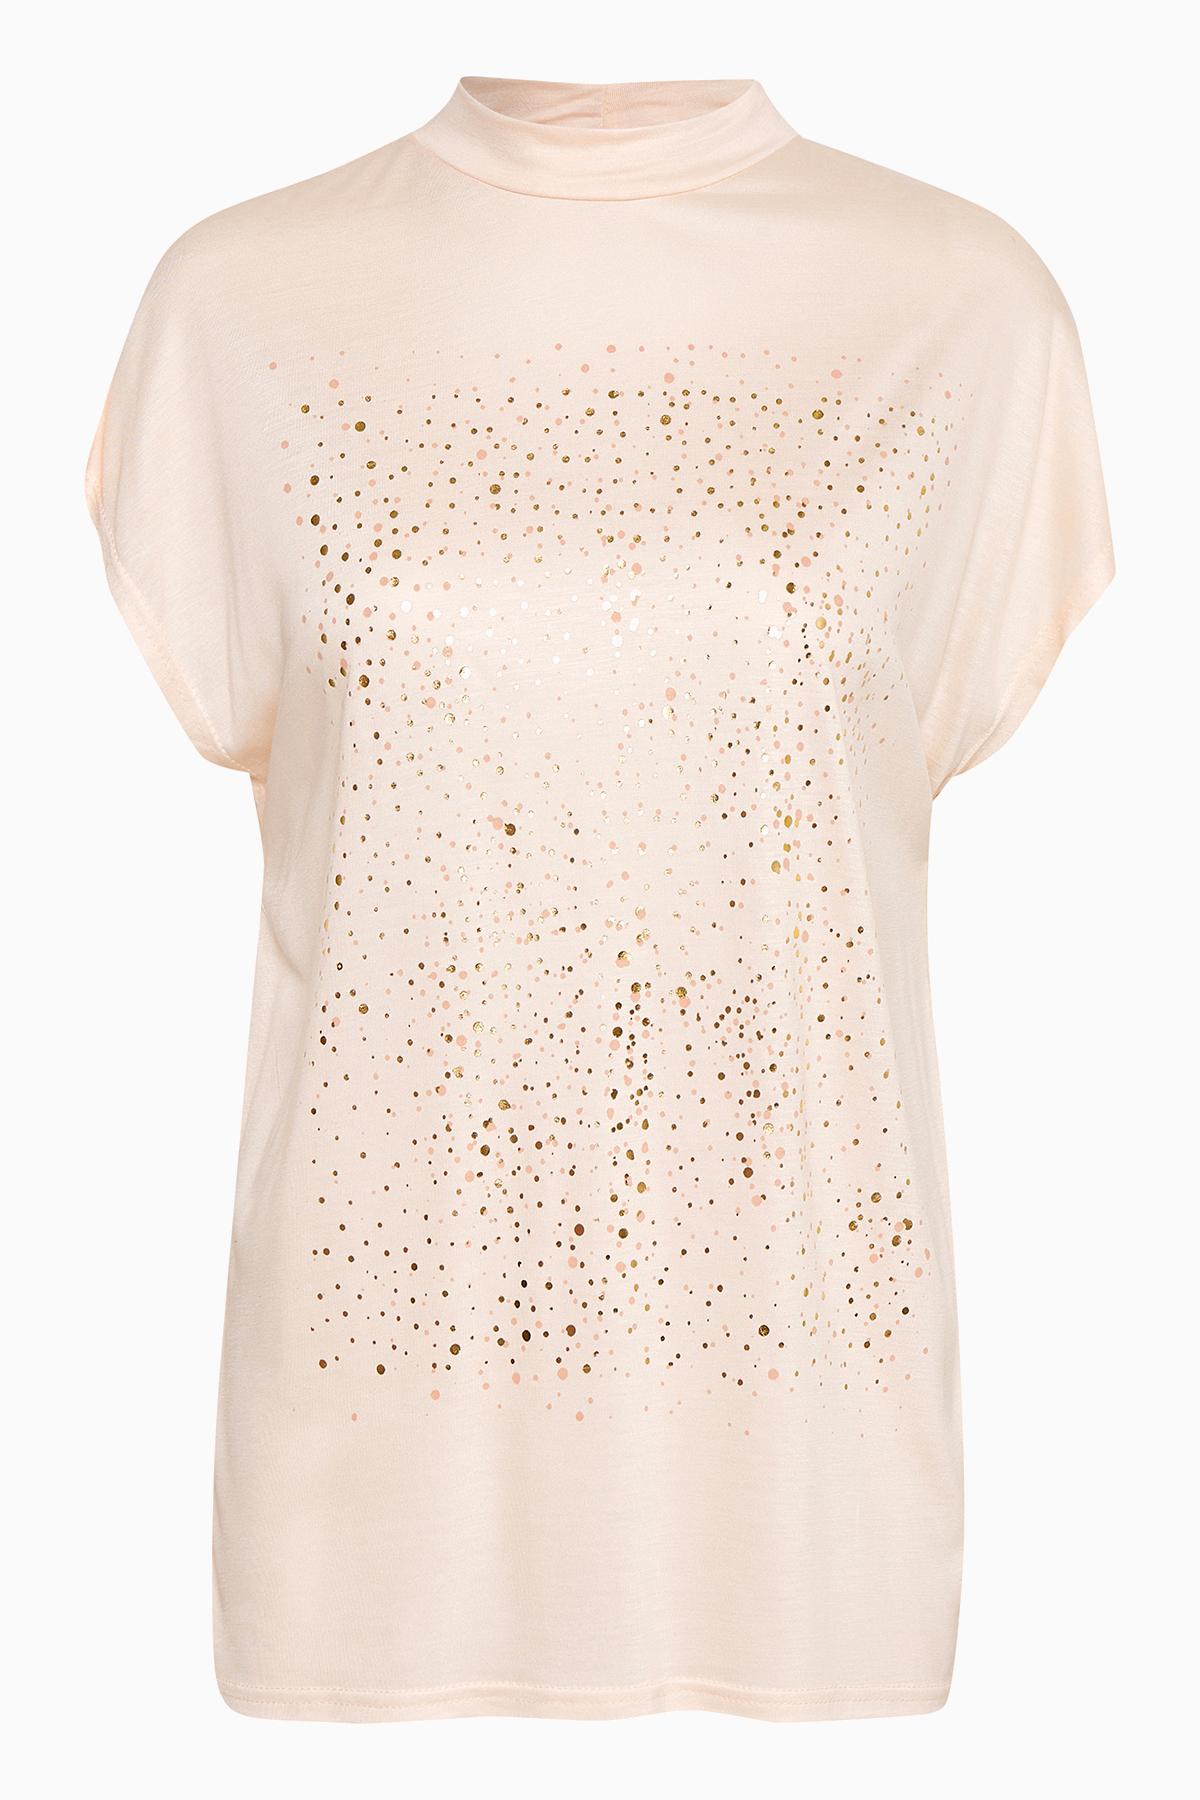 Puder Kurzarm T-Shirt von Kaffe – Shoppen Sie Puder Kurzarm T-Shirt ab Gr. XS-XXL hier